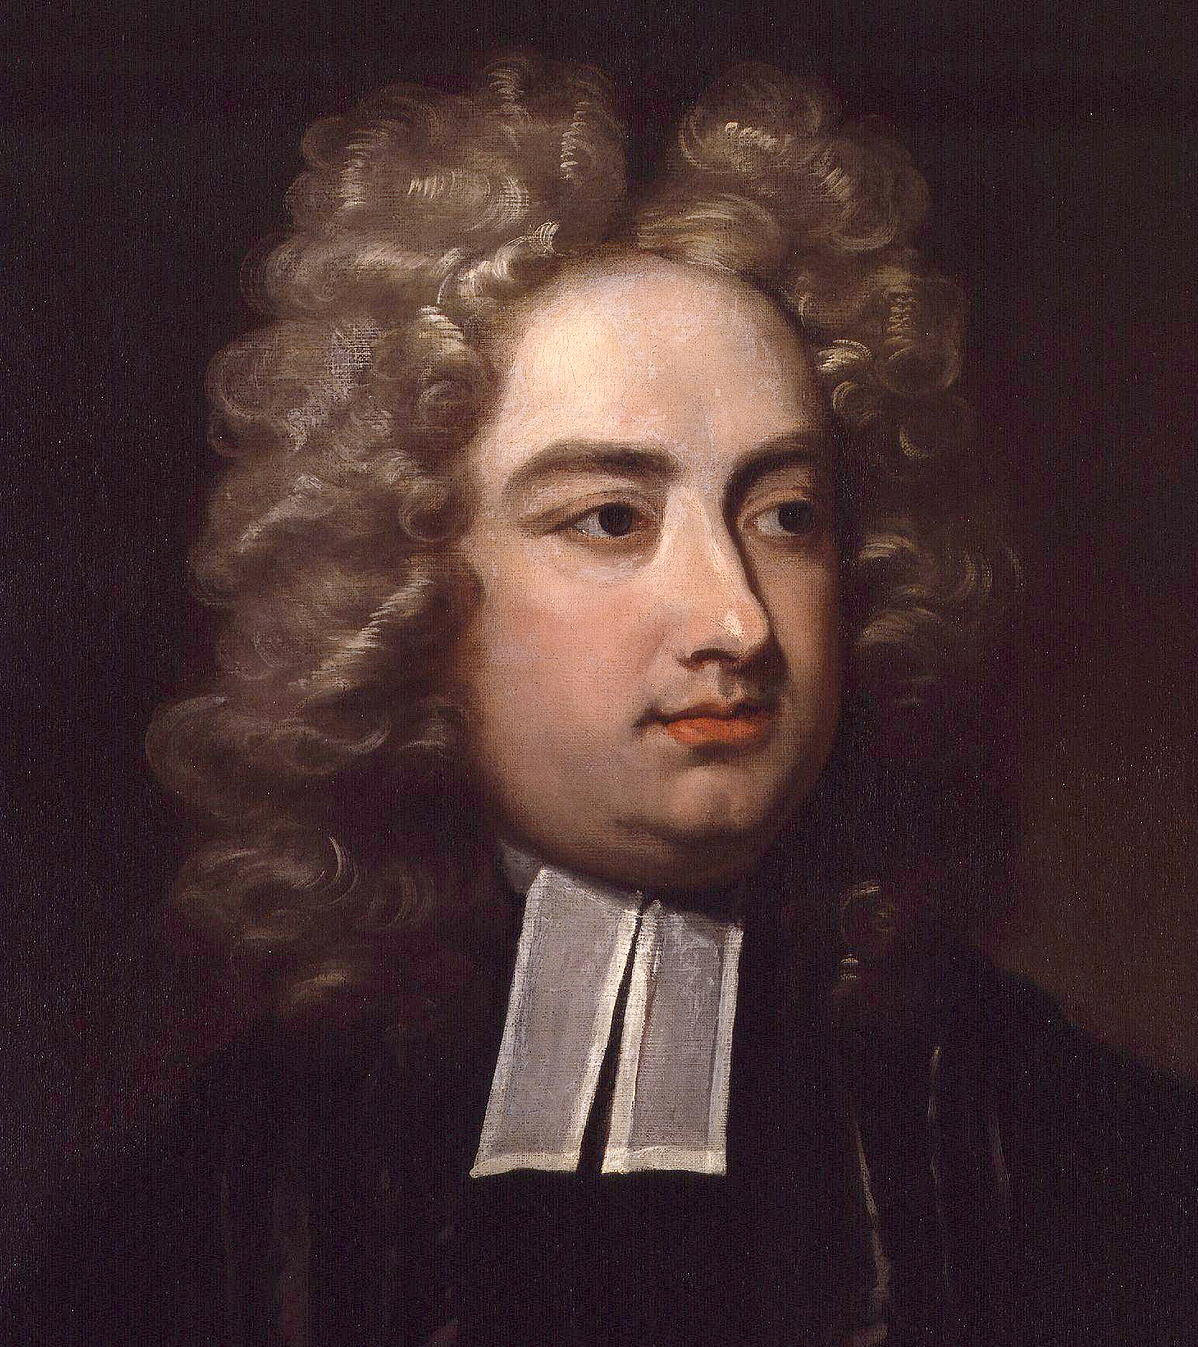 Jonathan_Swift_by_Charles_Jervas_detail-121301.jpg